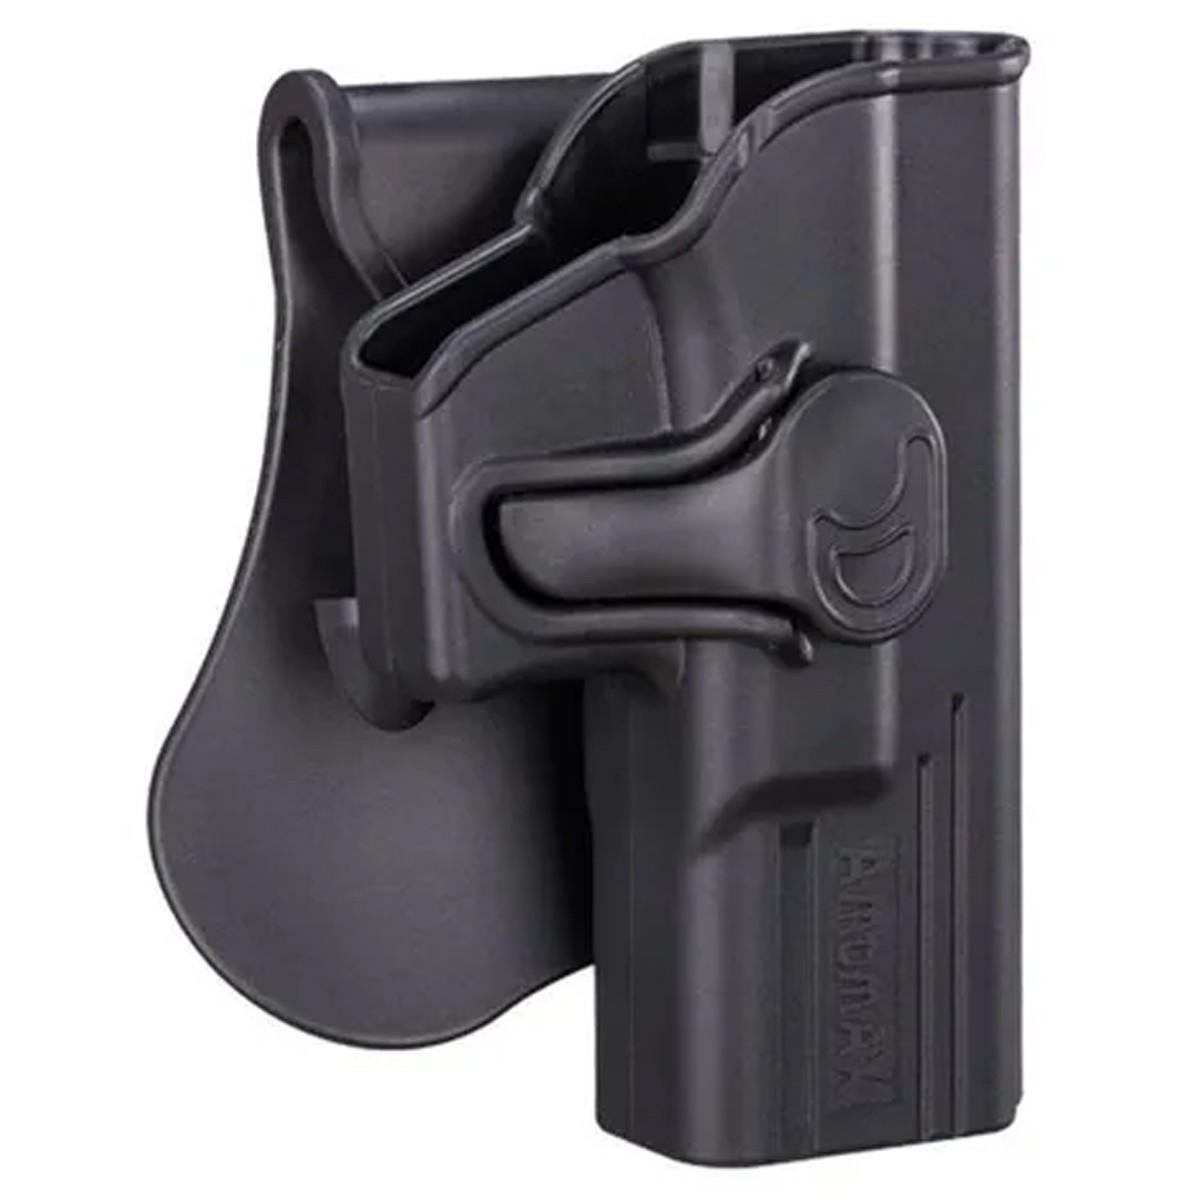 Coldre Destro Polímero Glock G17 G22 G31 Amomax